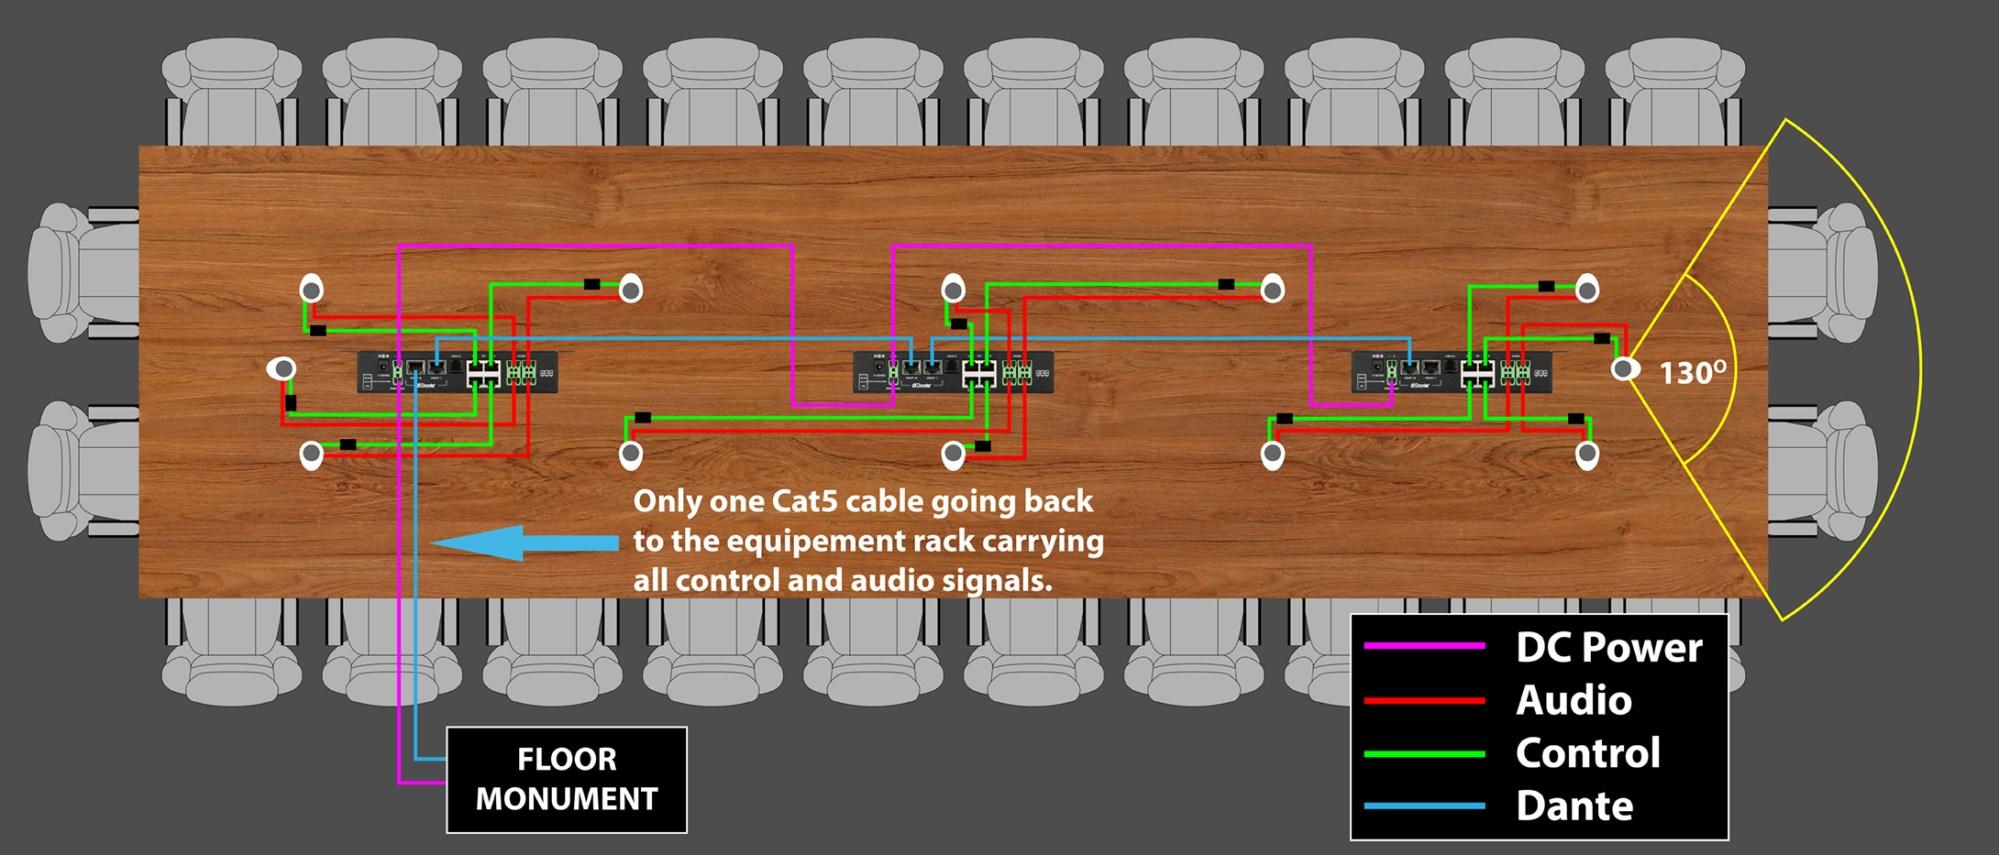 hight resolution of cdt wiring diagram wiring diagram forward rover 75 cdt wiring diagram cdt wiring diagram